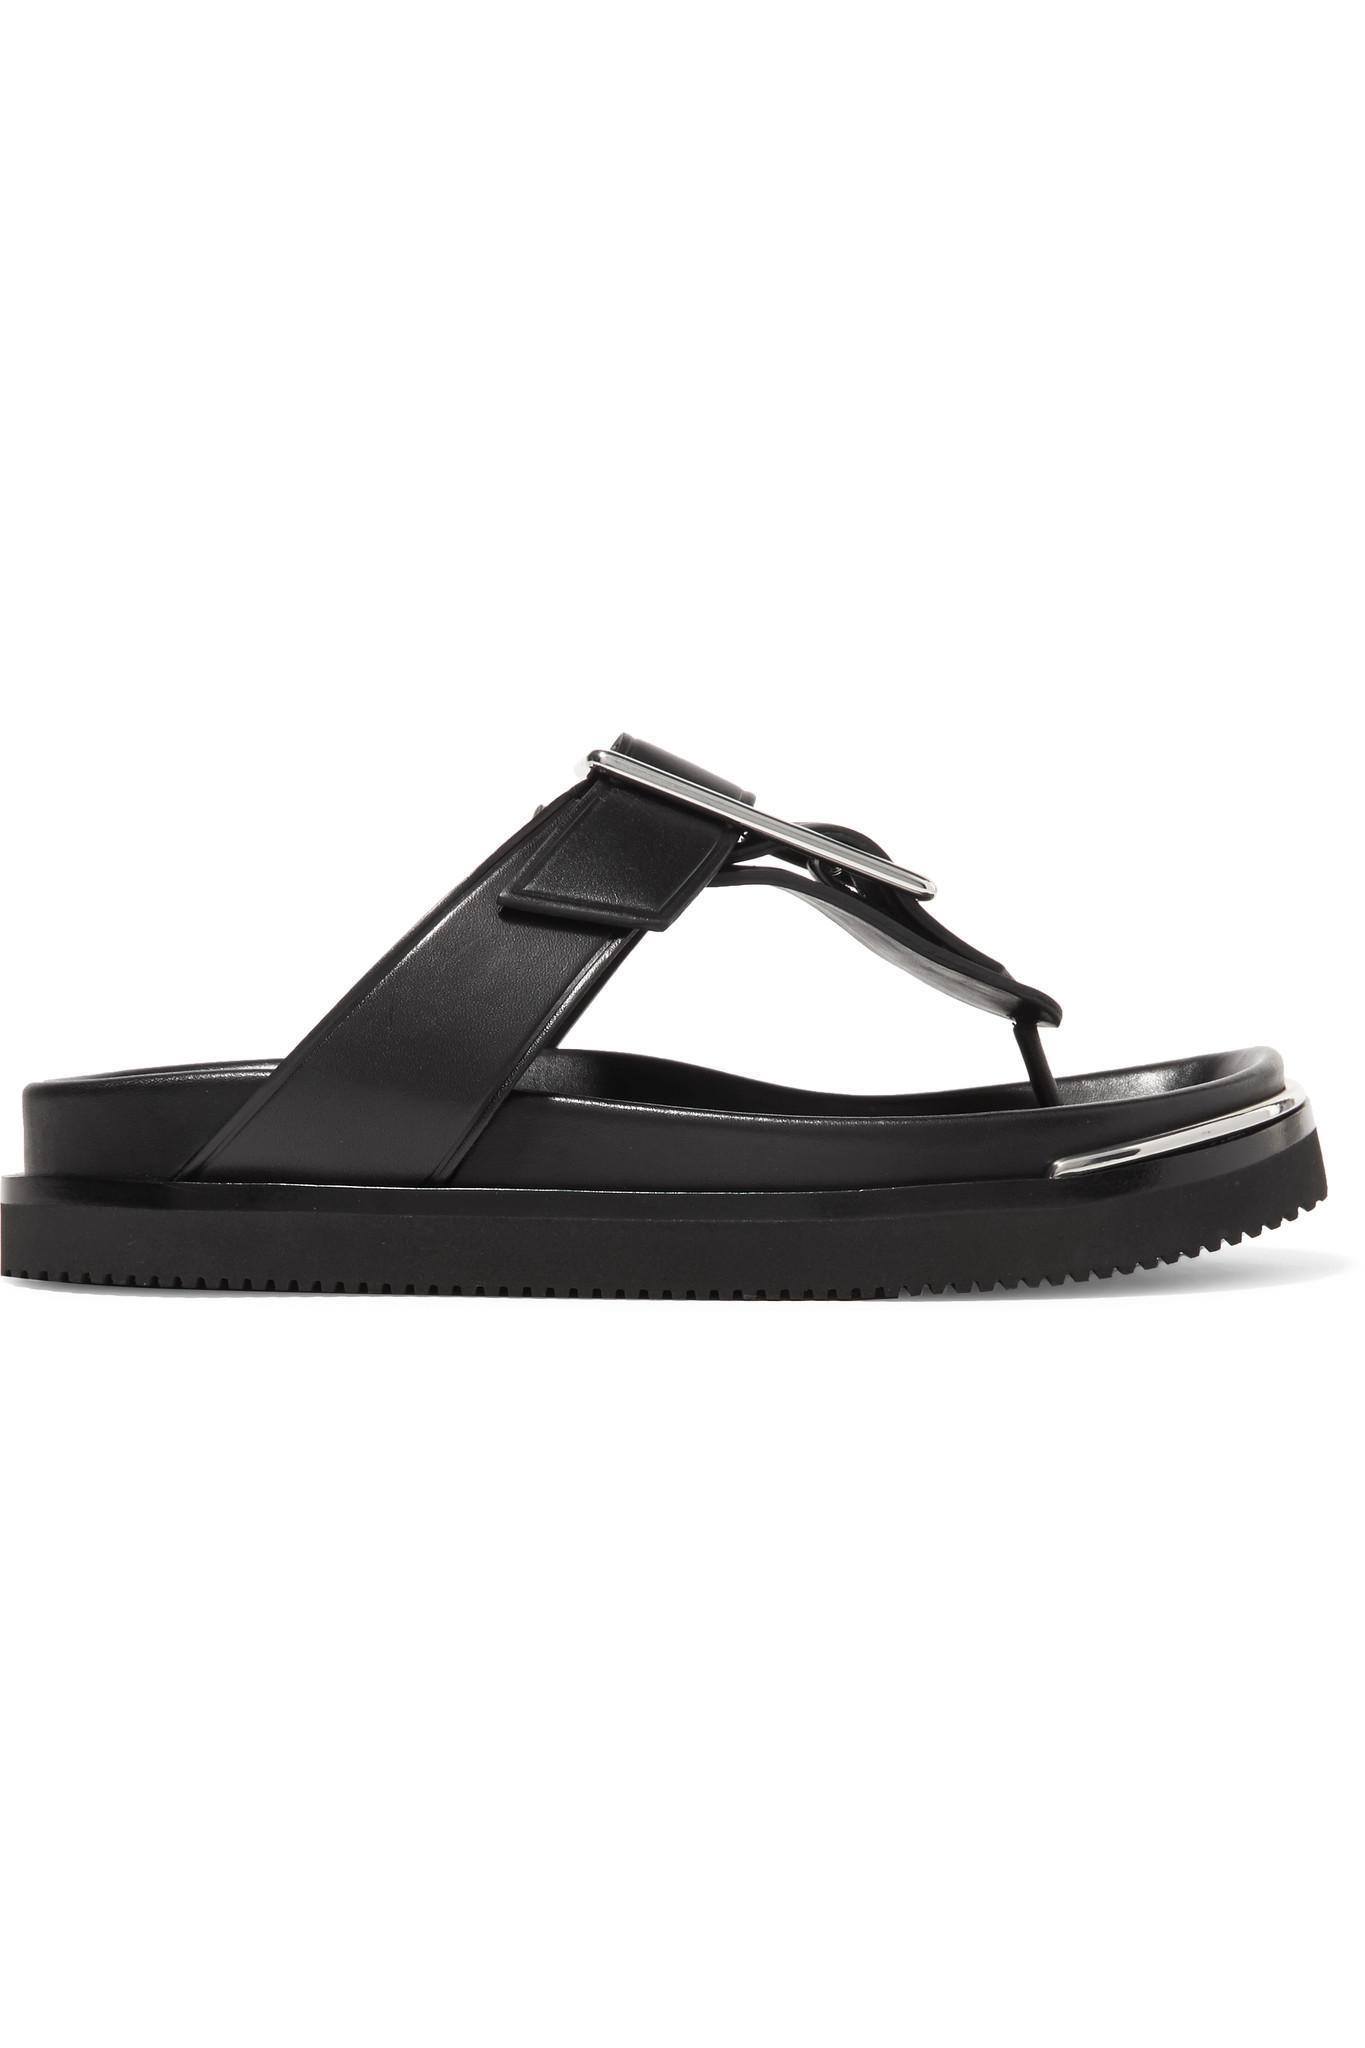 MM6 Maison Martin Margiela Black Corin Sandals